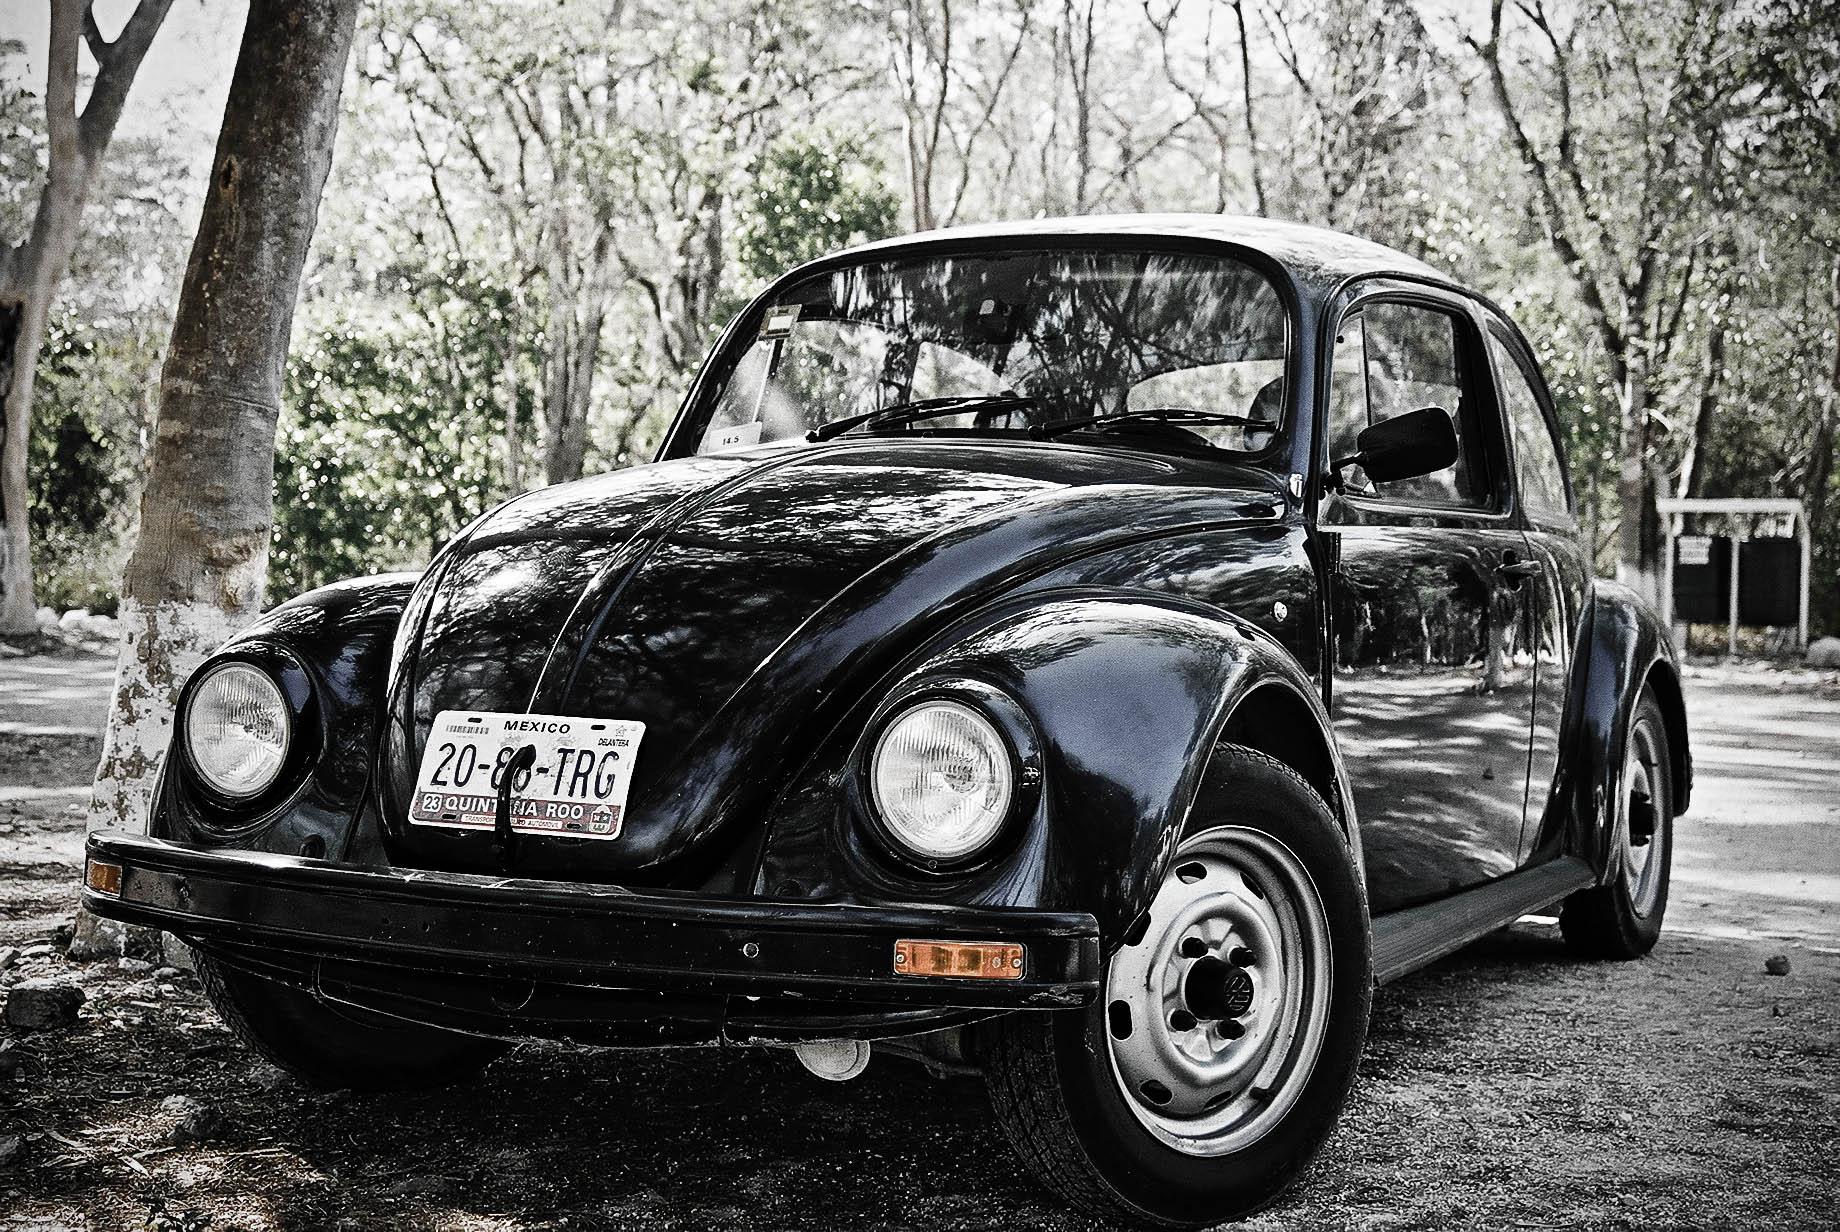 VW Kever Mexico 2003